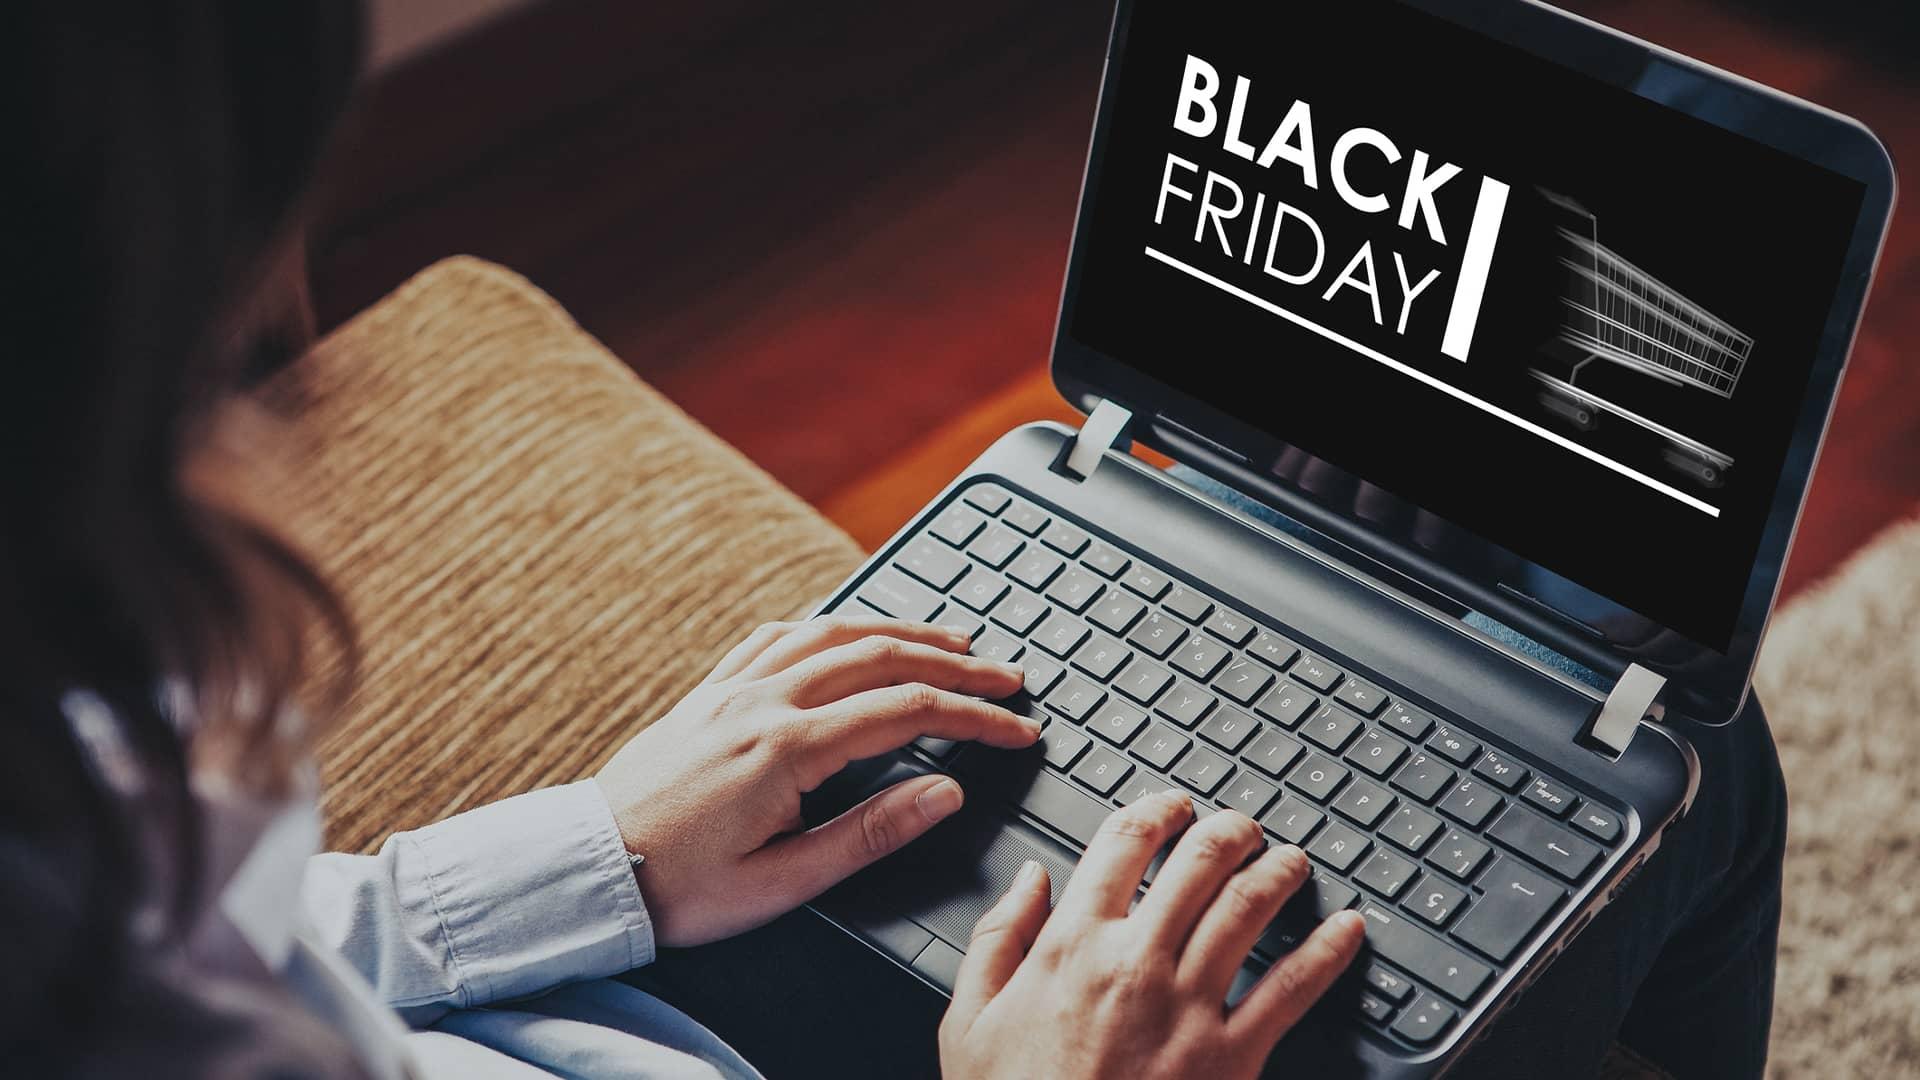 Ofertas de móviles Black Friday 2021: ¡aprovéchalas!